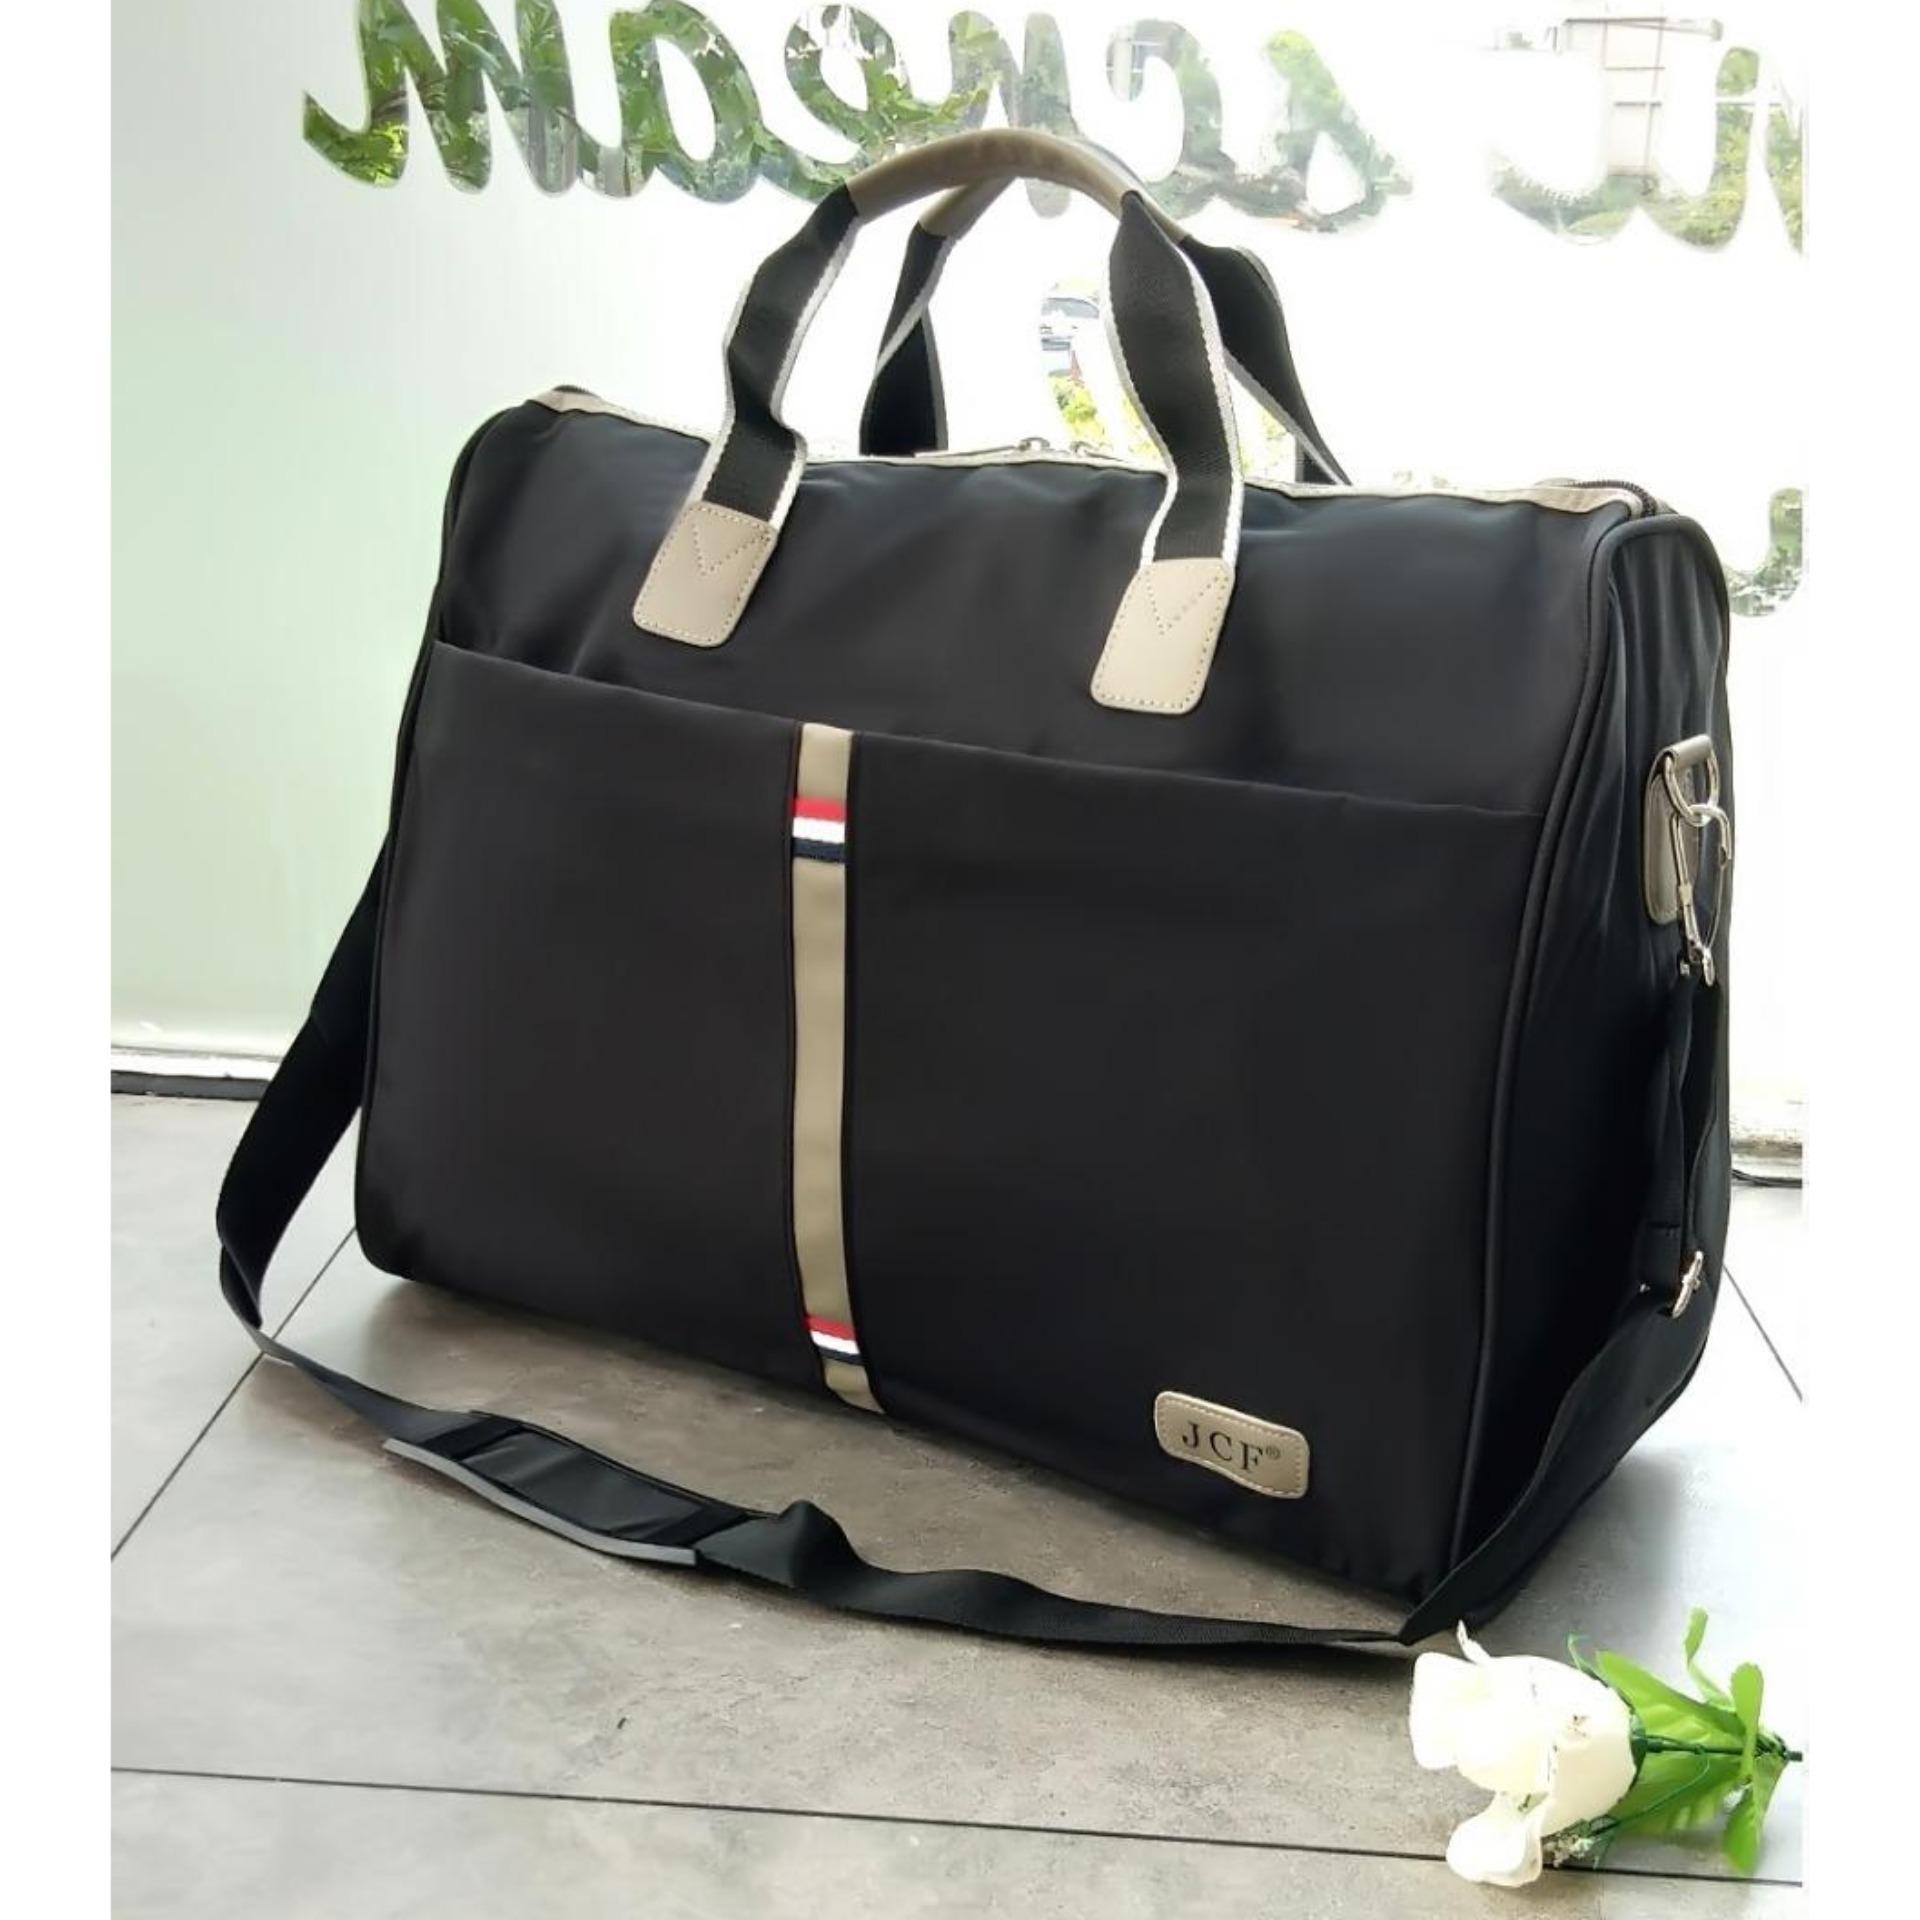 JCF Tas Travel Bag Import Kanvas Tebal Bagus Korean Style Fashion Wanita  Pria Tas Pakaian Multi Fungsi Tas jinjing Dan Tas Selempang – Milenial Black 51eddd6159